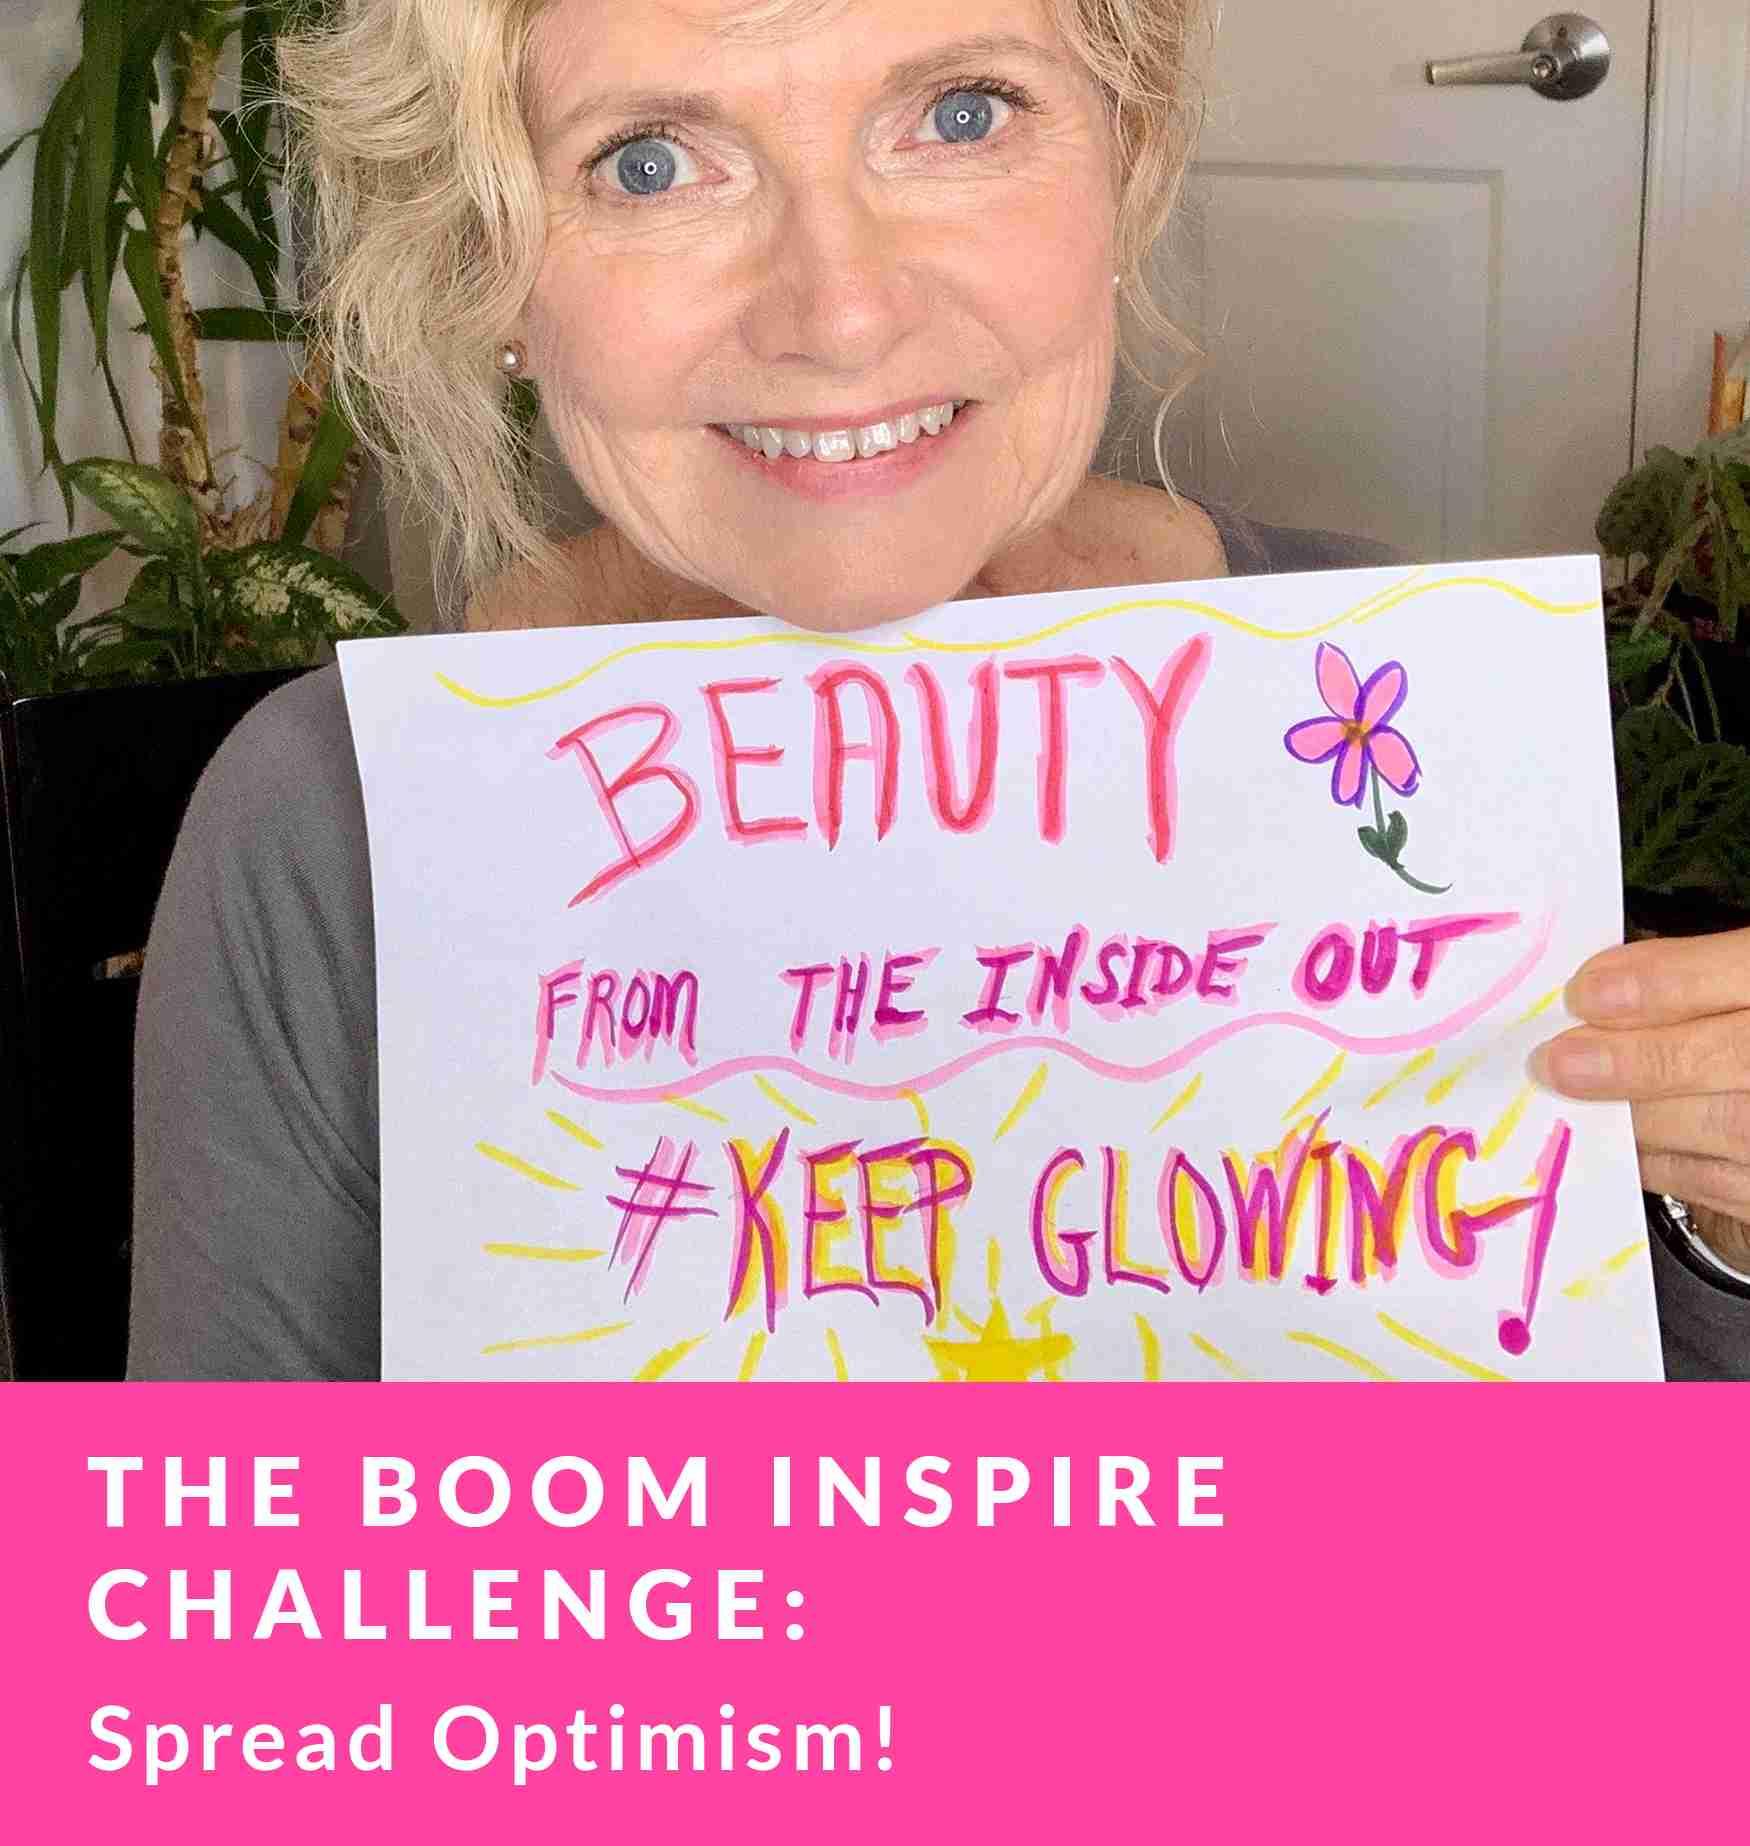 The Boom Inspire Challenge: Spread Optimism!